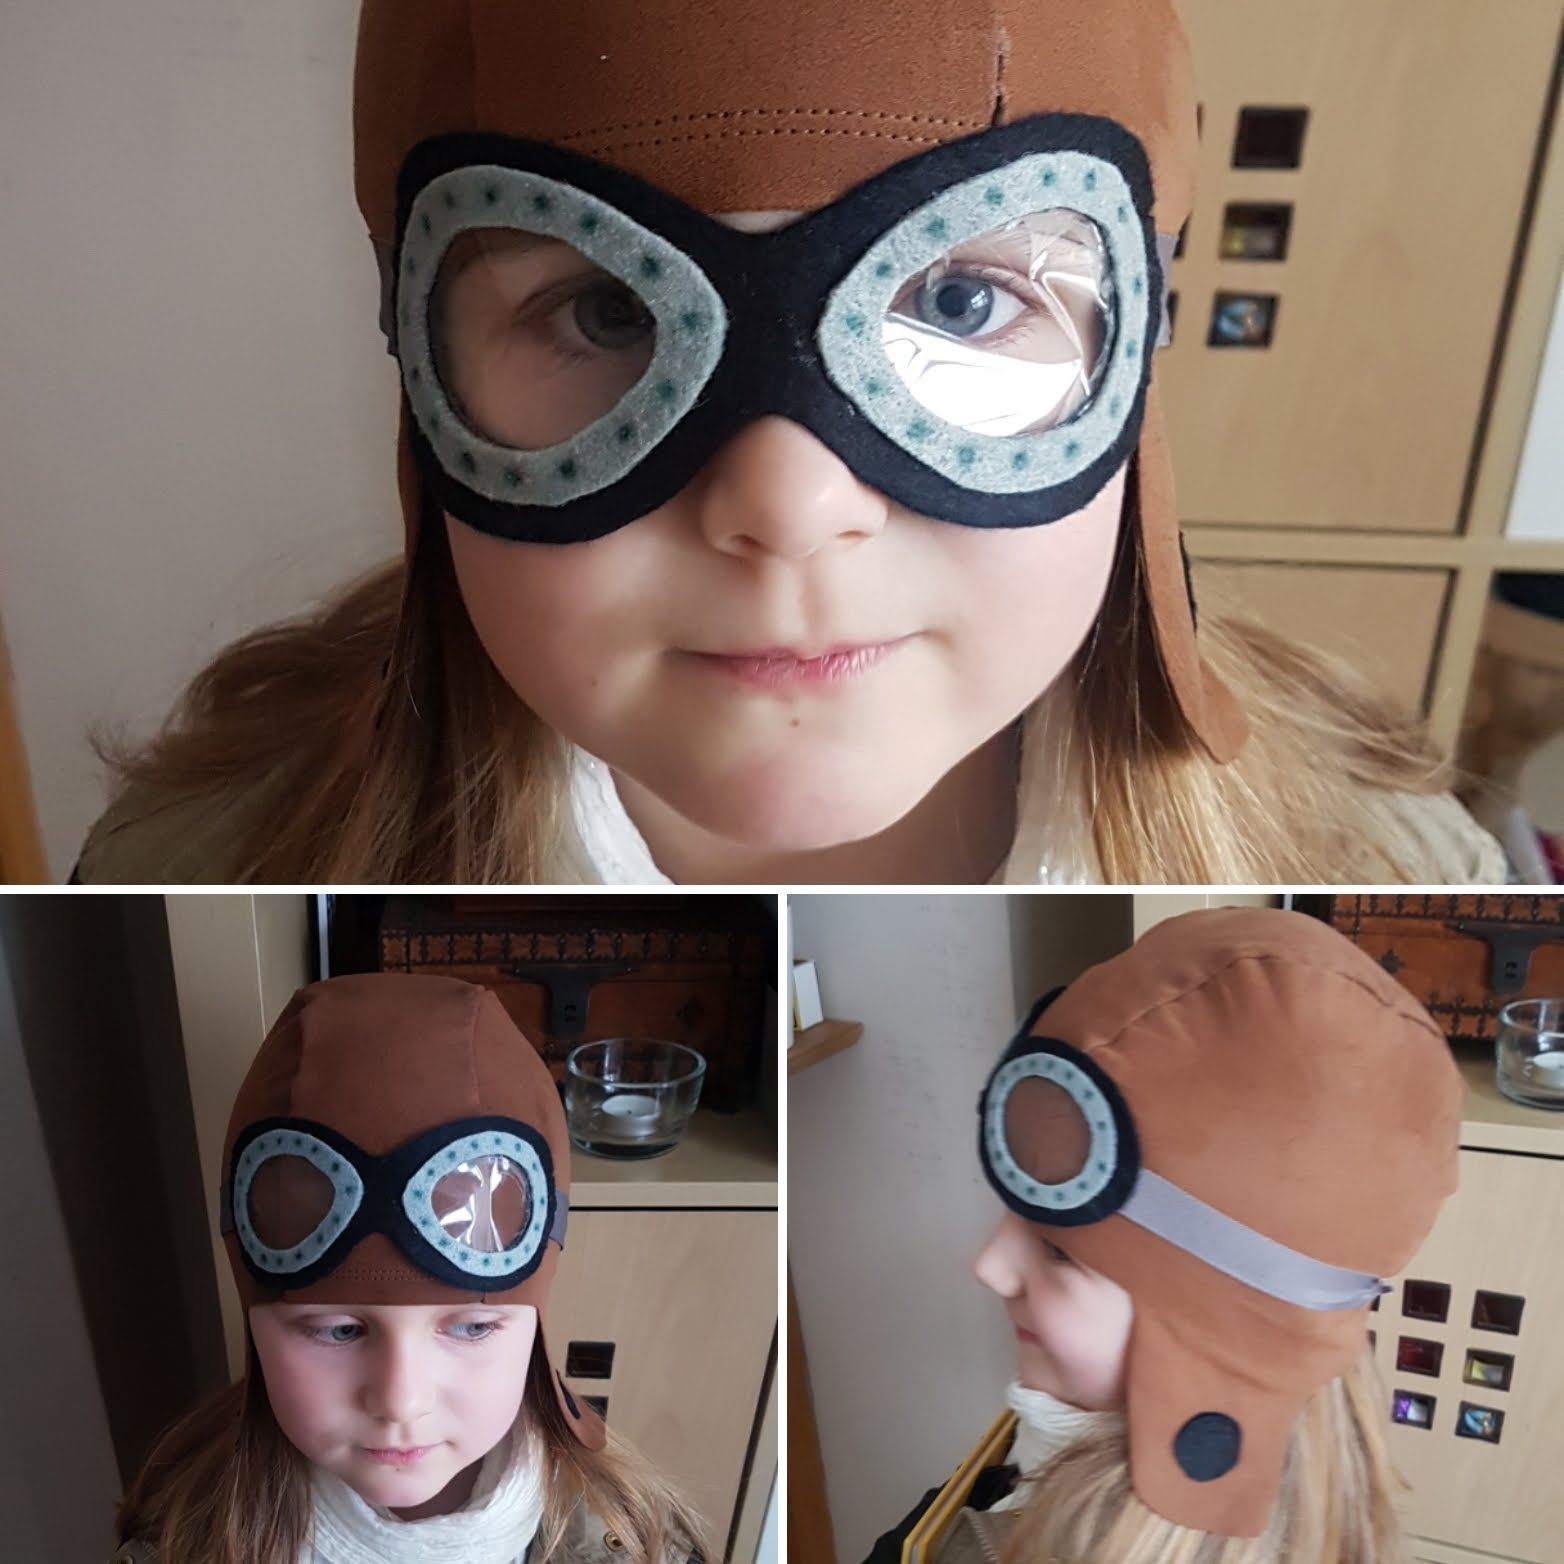 Diy Aviator Goggles World Book Day Amelia Earhart Costume Diy Amelia Earhart Costume Aviator Goggles